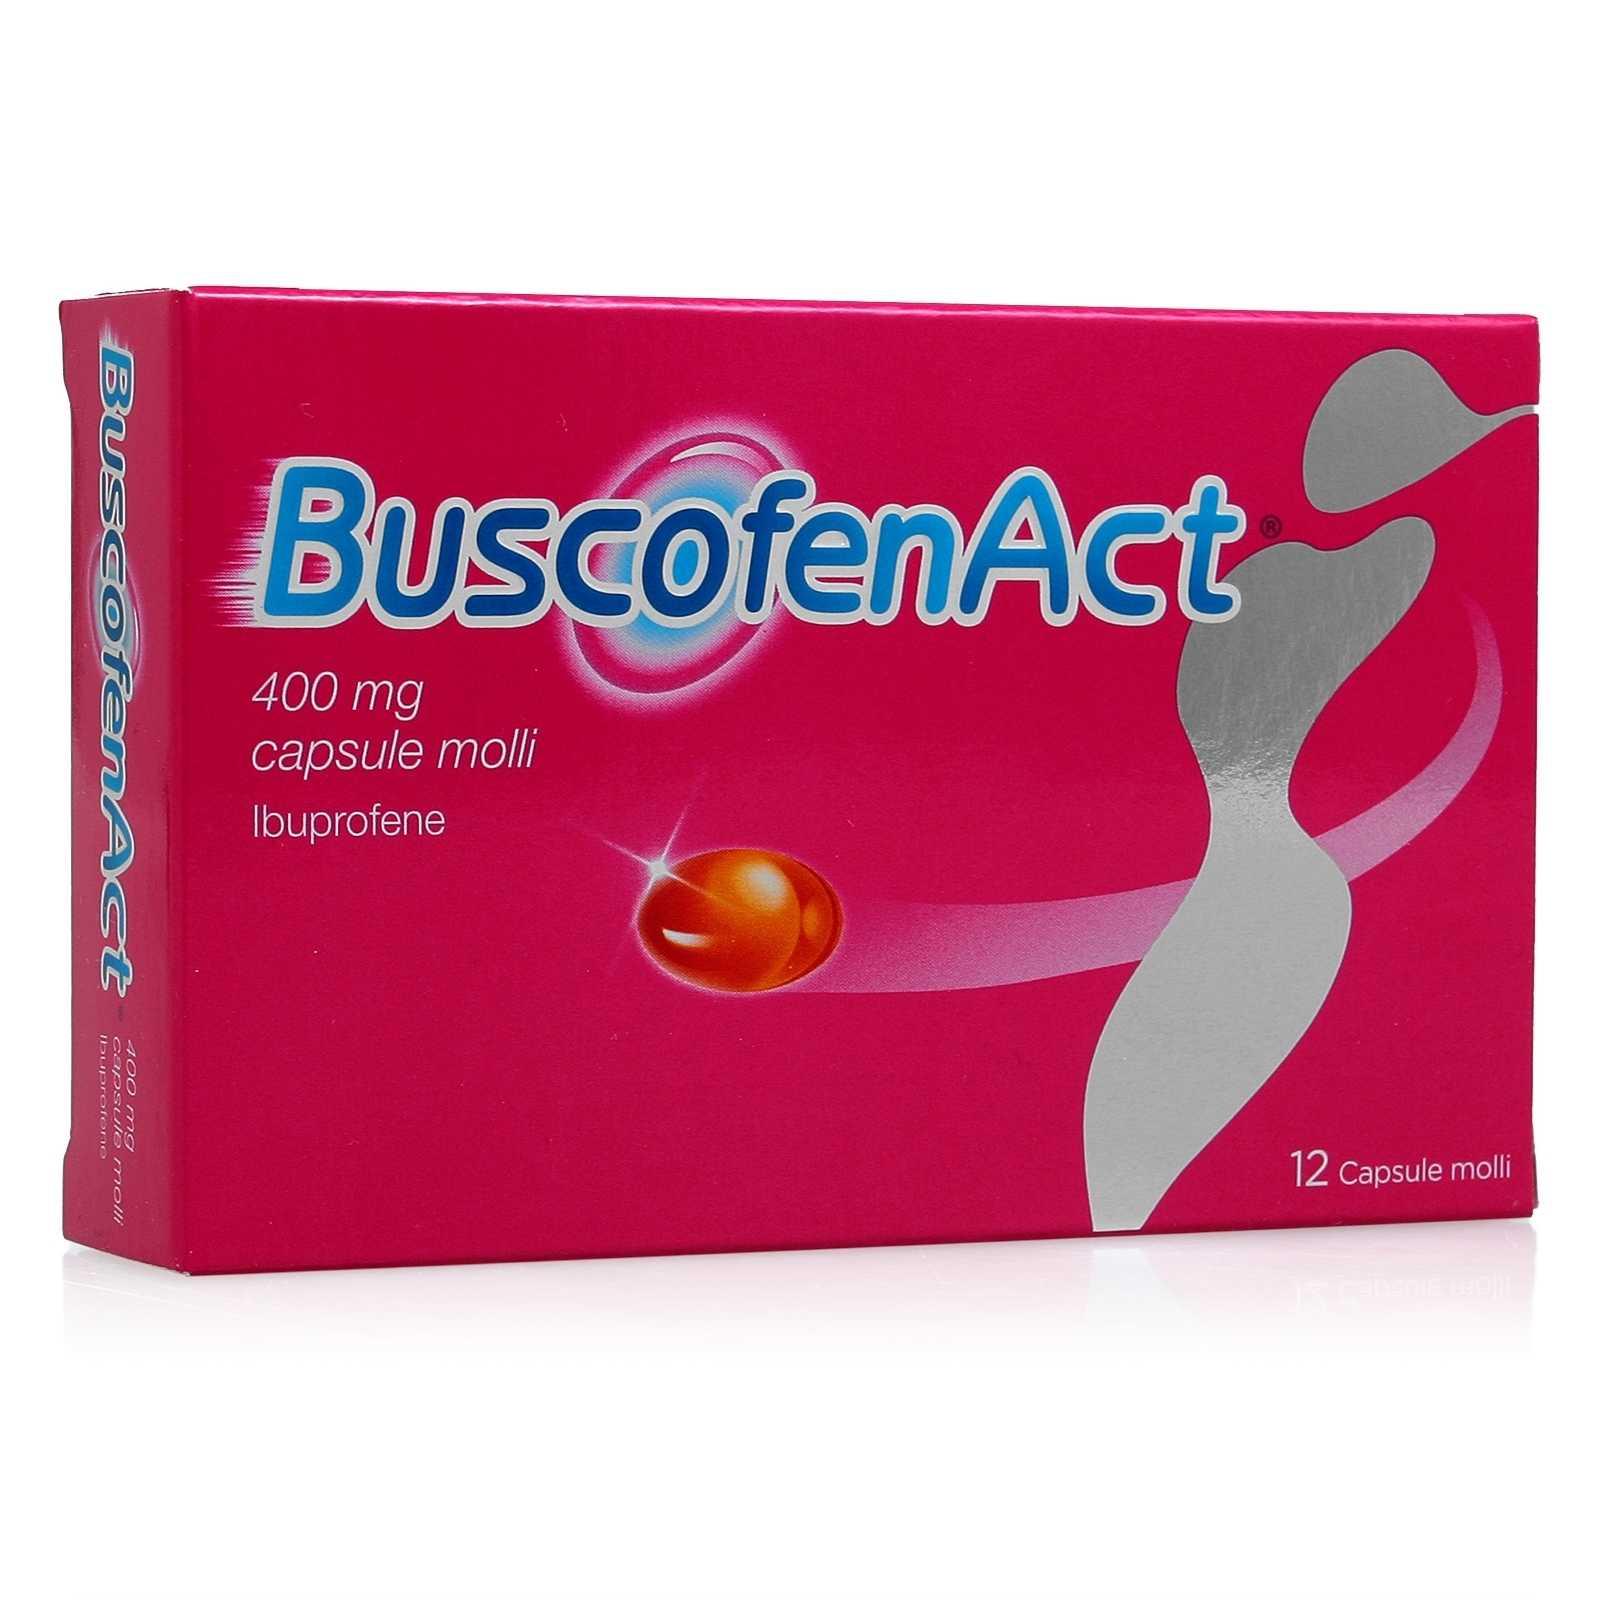 Buscofen - Act - 12 capsule